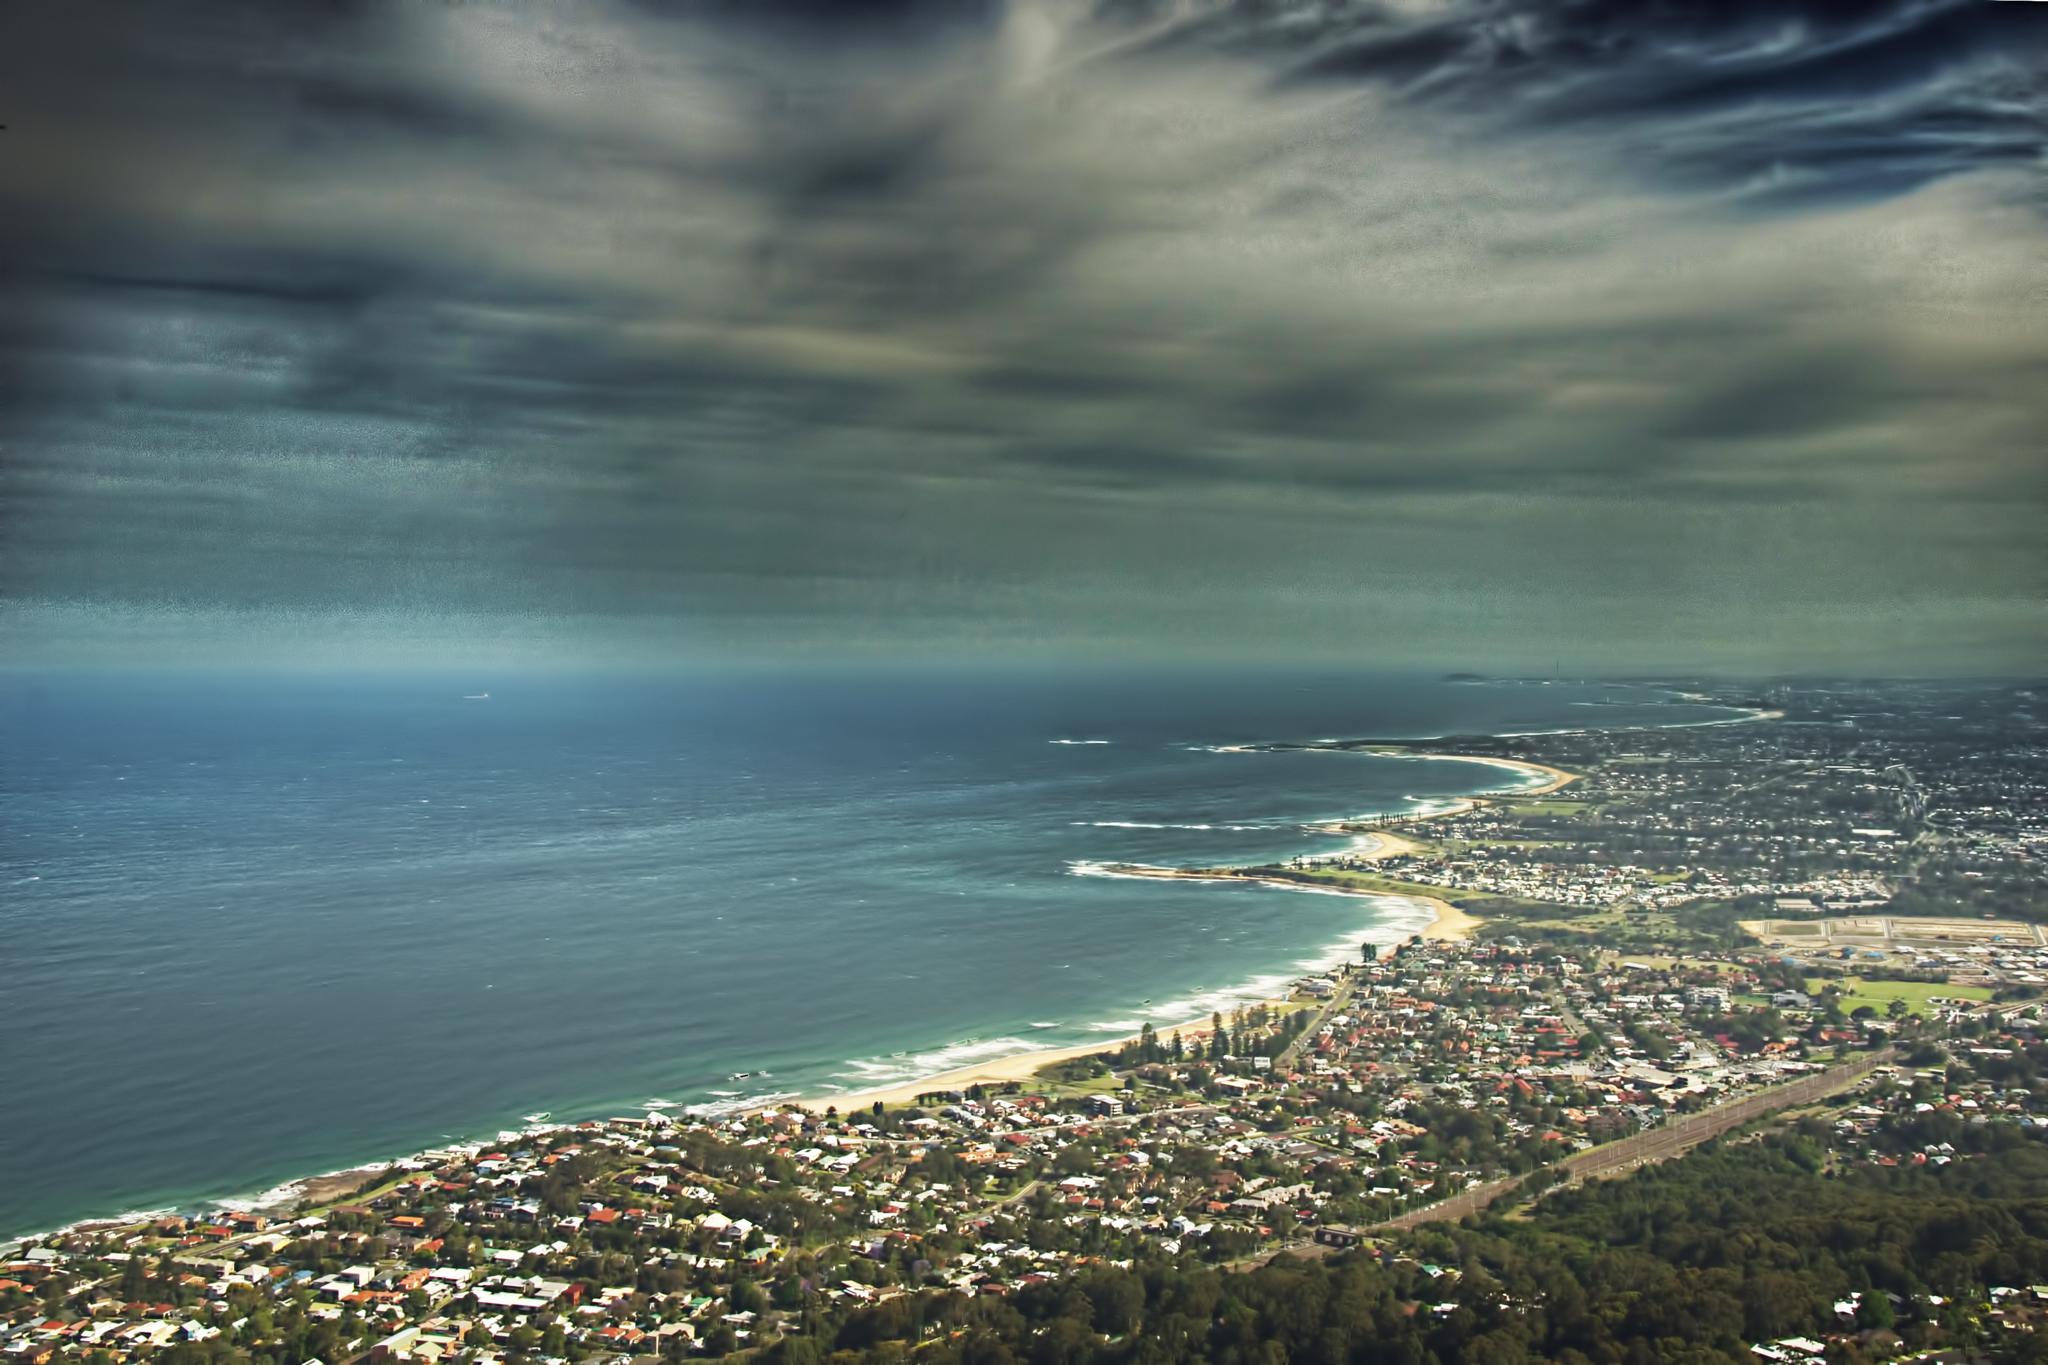 Above Wollongong